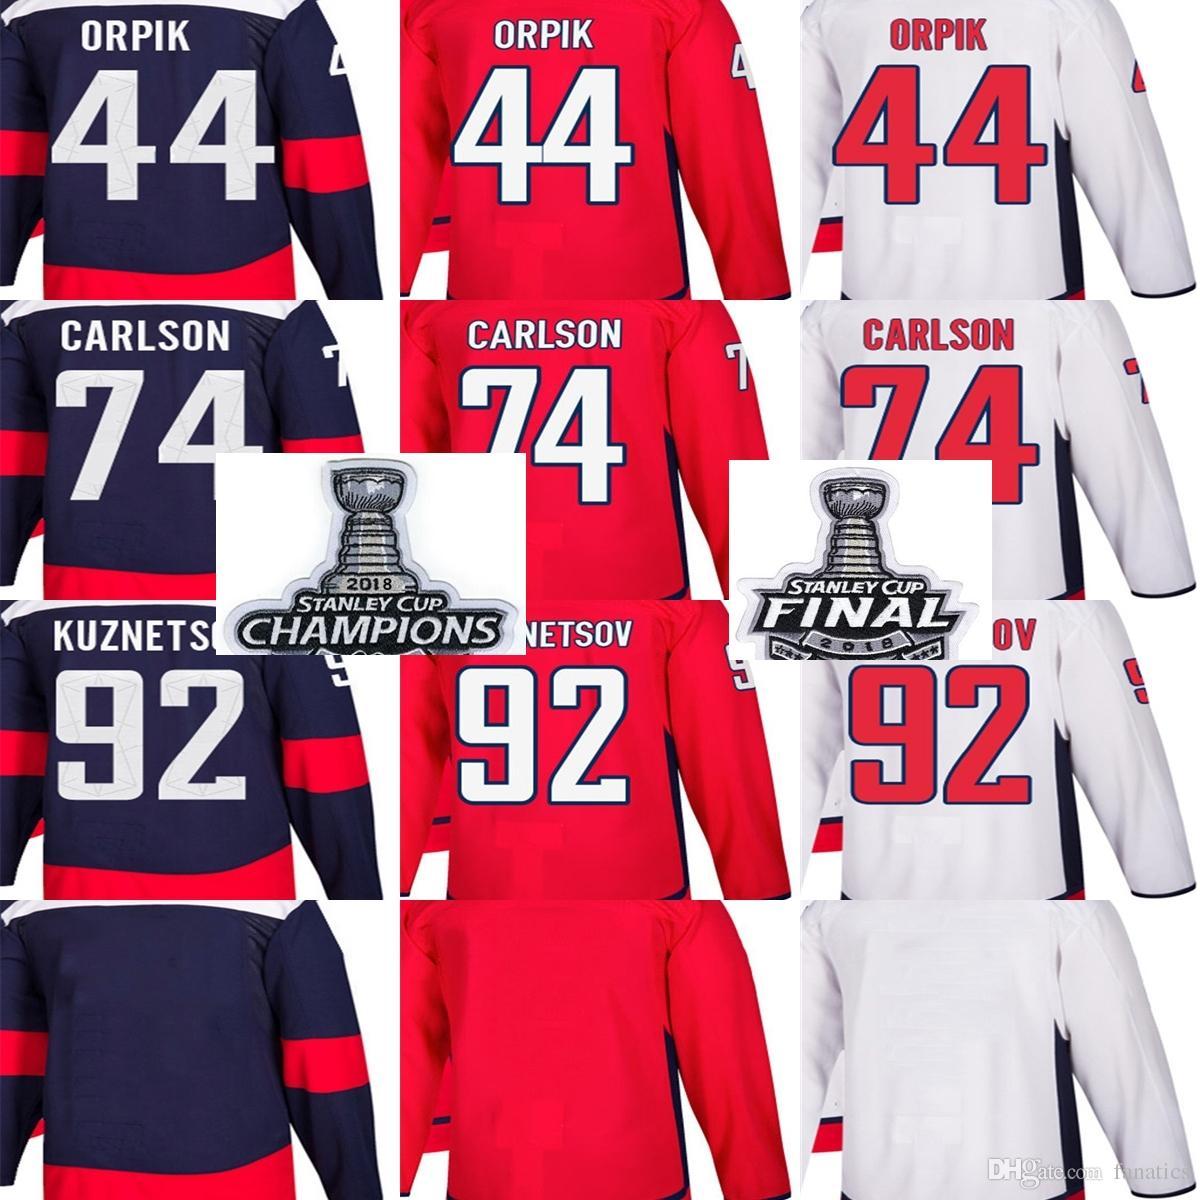 2019 Cheap 2018 Stanley Cup Champions Final Men Washington Capitals Brooks  Orpik John Carlson Evgeny Kuznetsov Blank Red Custom Hockey Jerseys From  Fanatics ... 0d4e8f04a